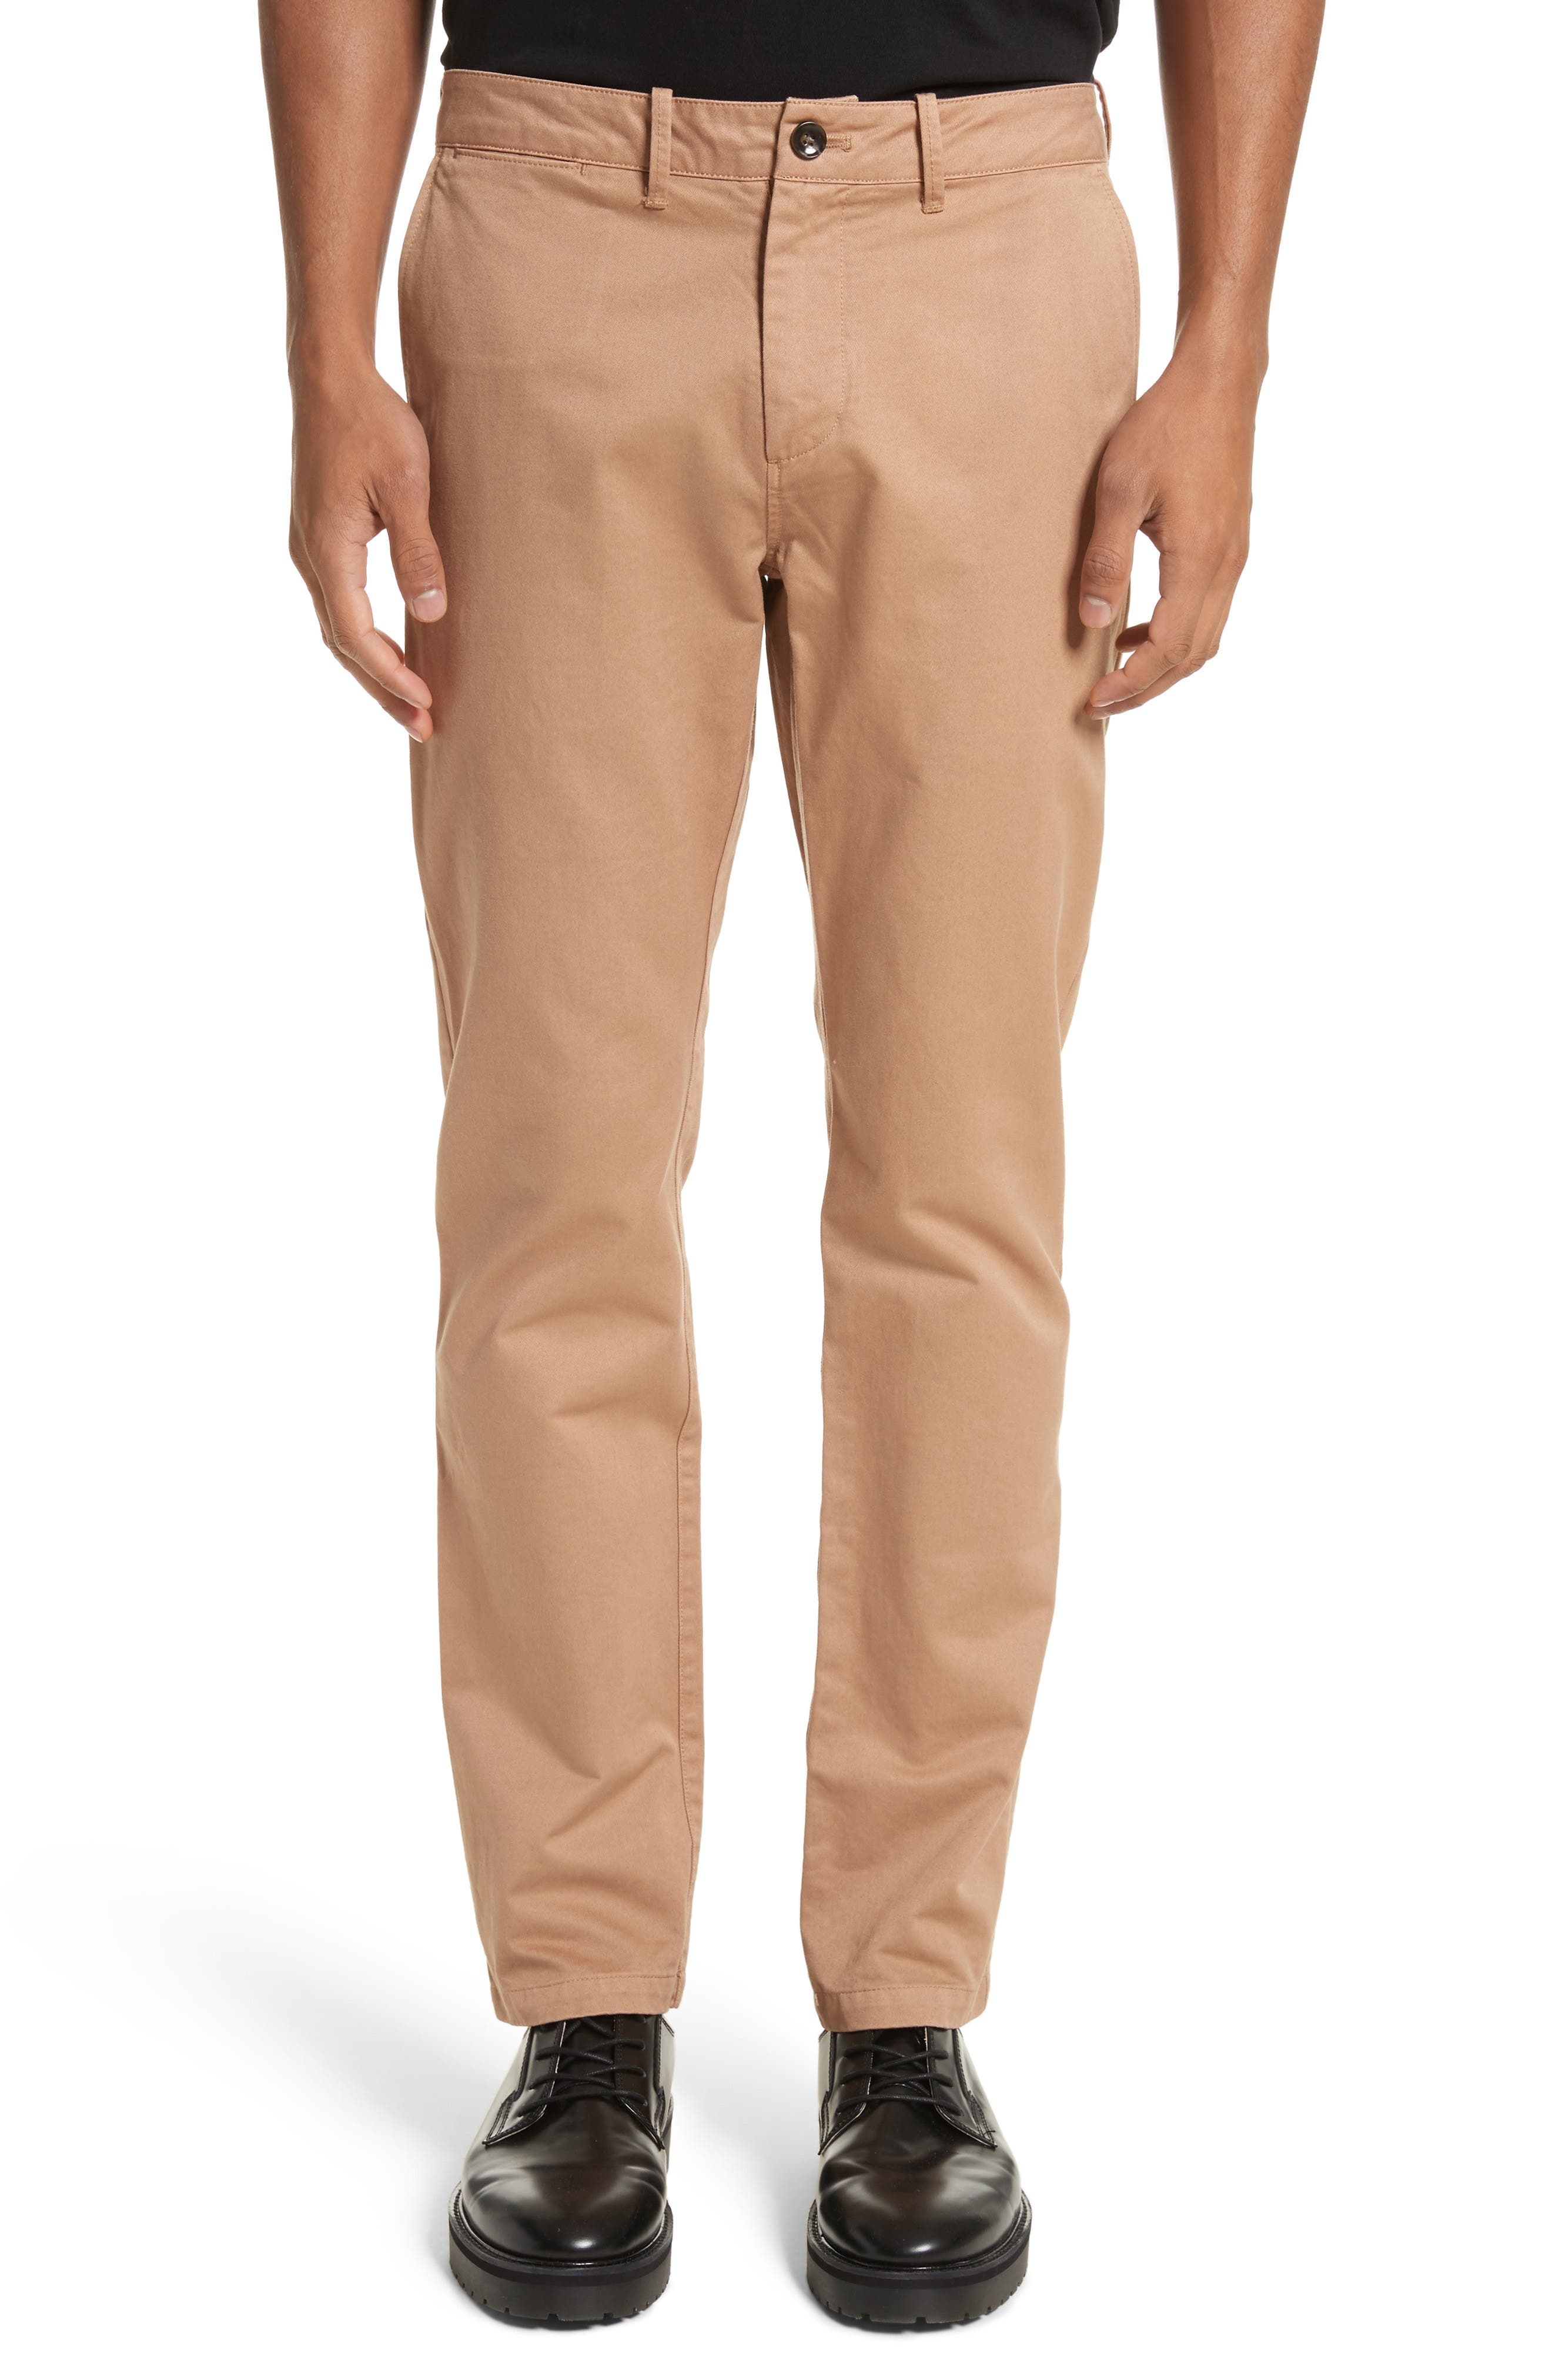 John Chino Trousers,                         Main,                         color, 263